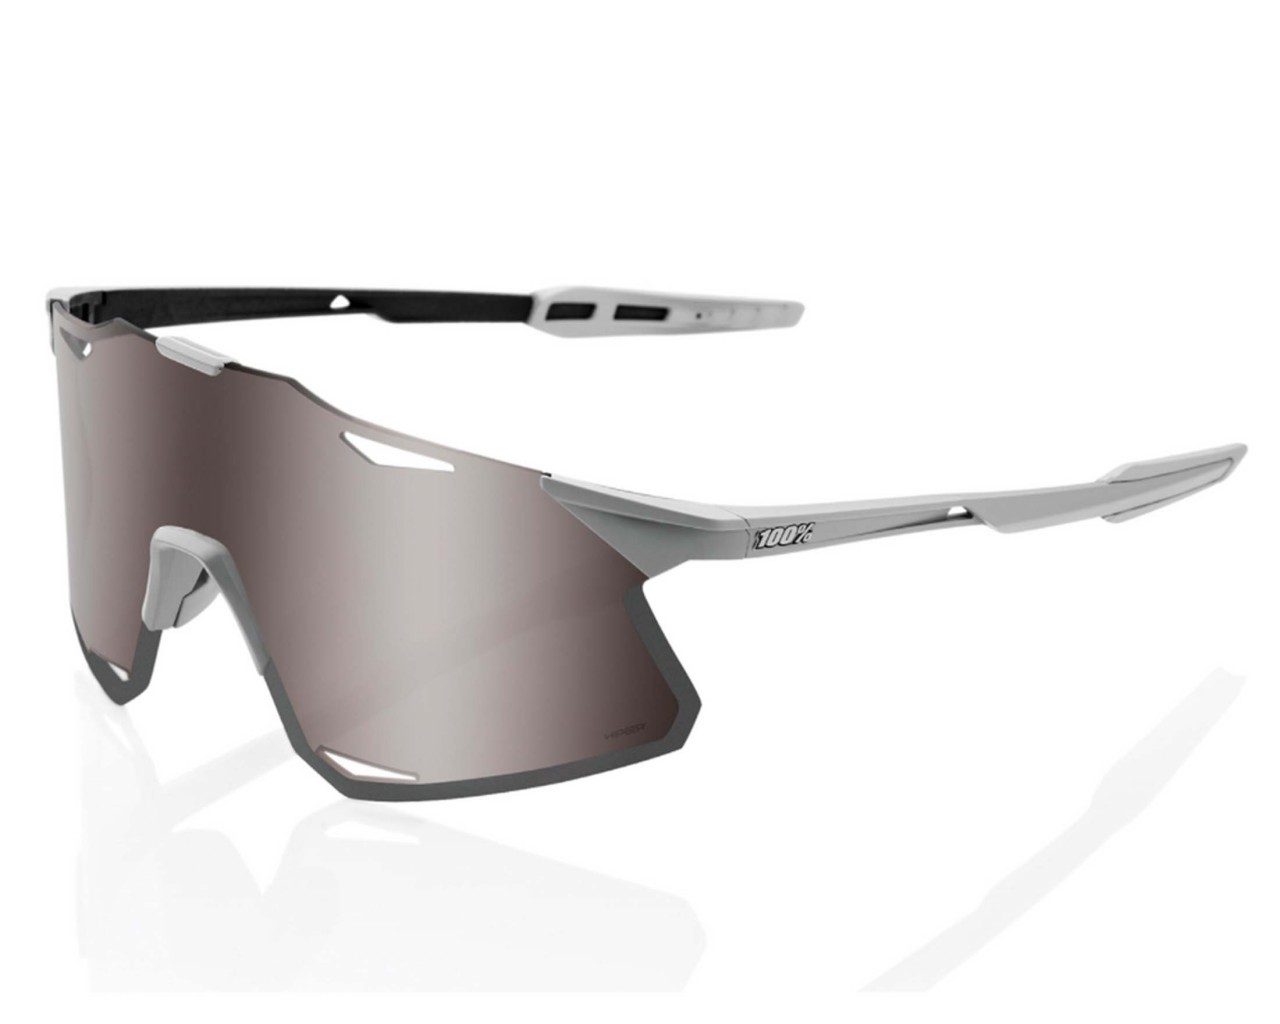 100% Hypercraft - Hiper Lens Sports sunglasses | matt stone grey-silver